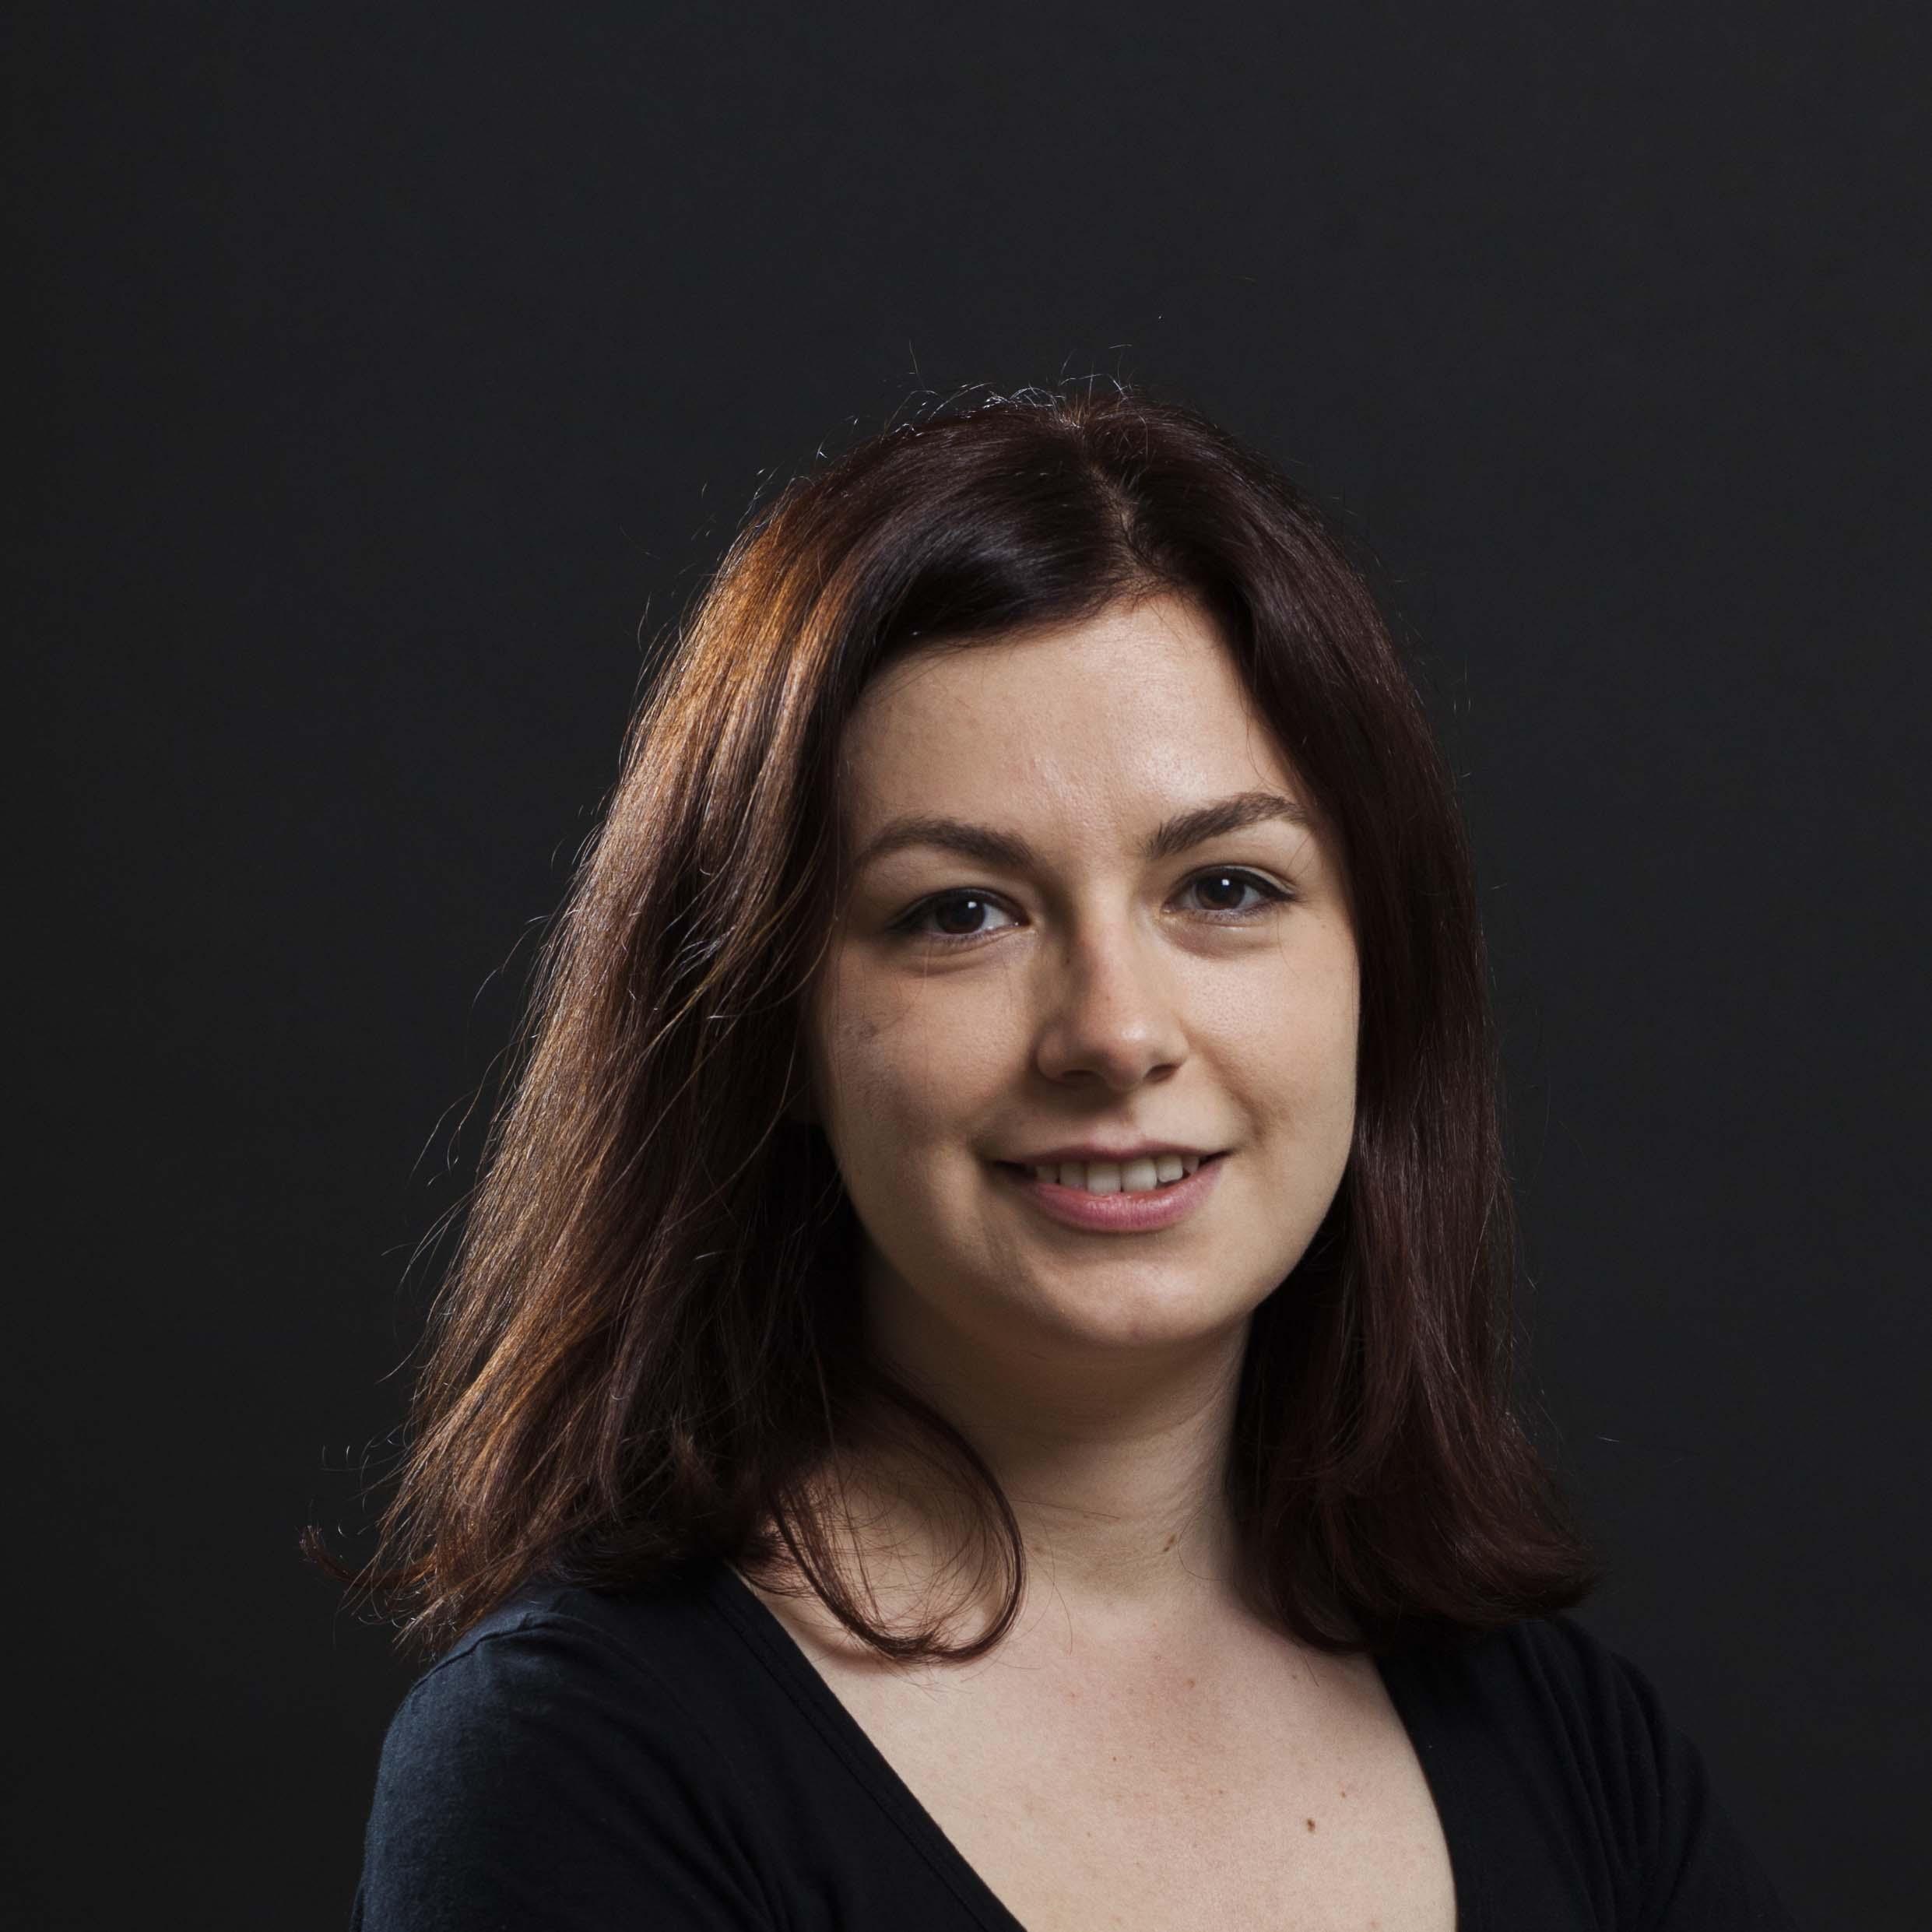 Milena Filipovic